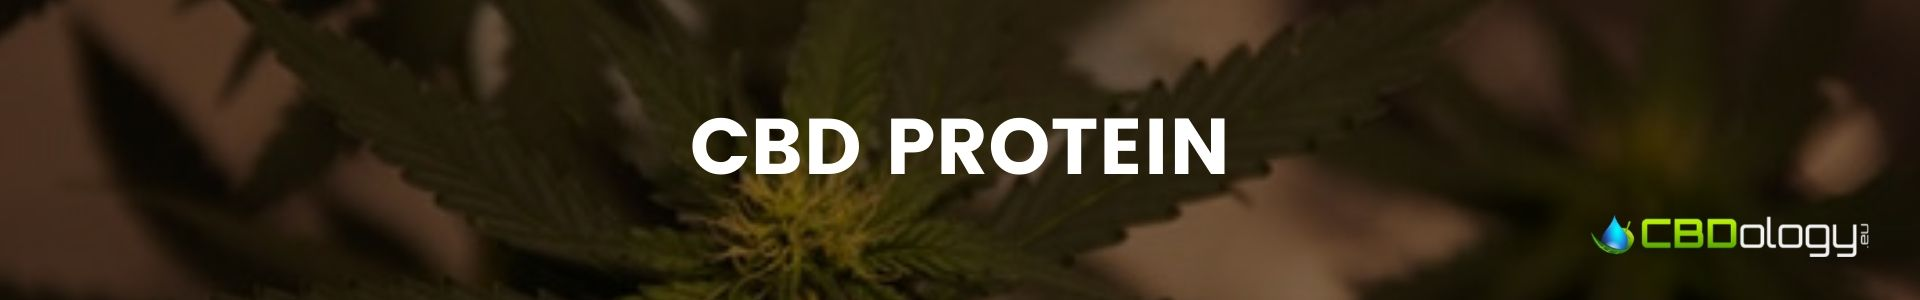 CBD Protein